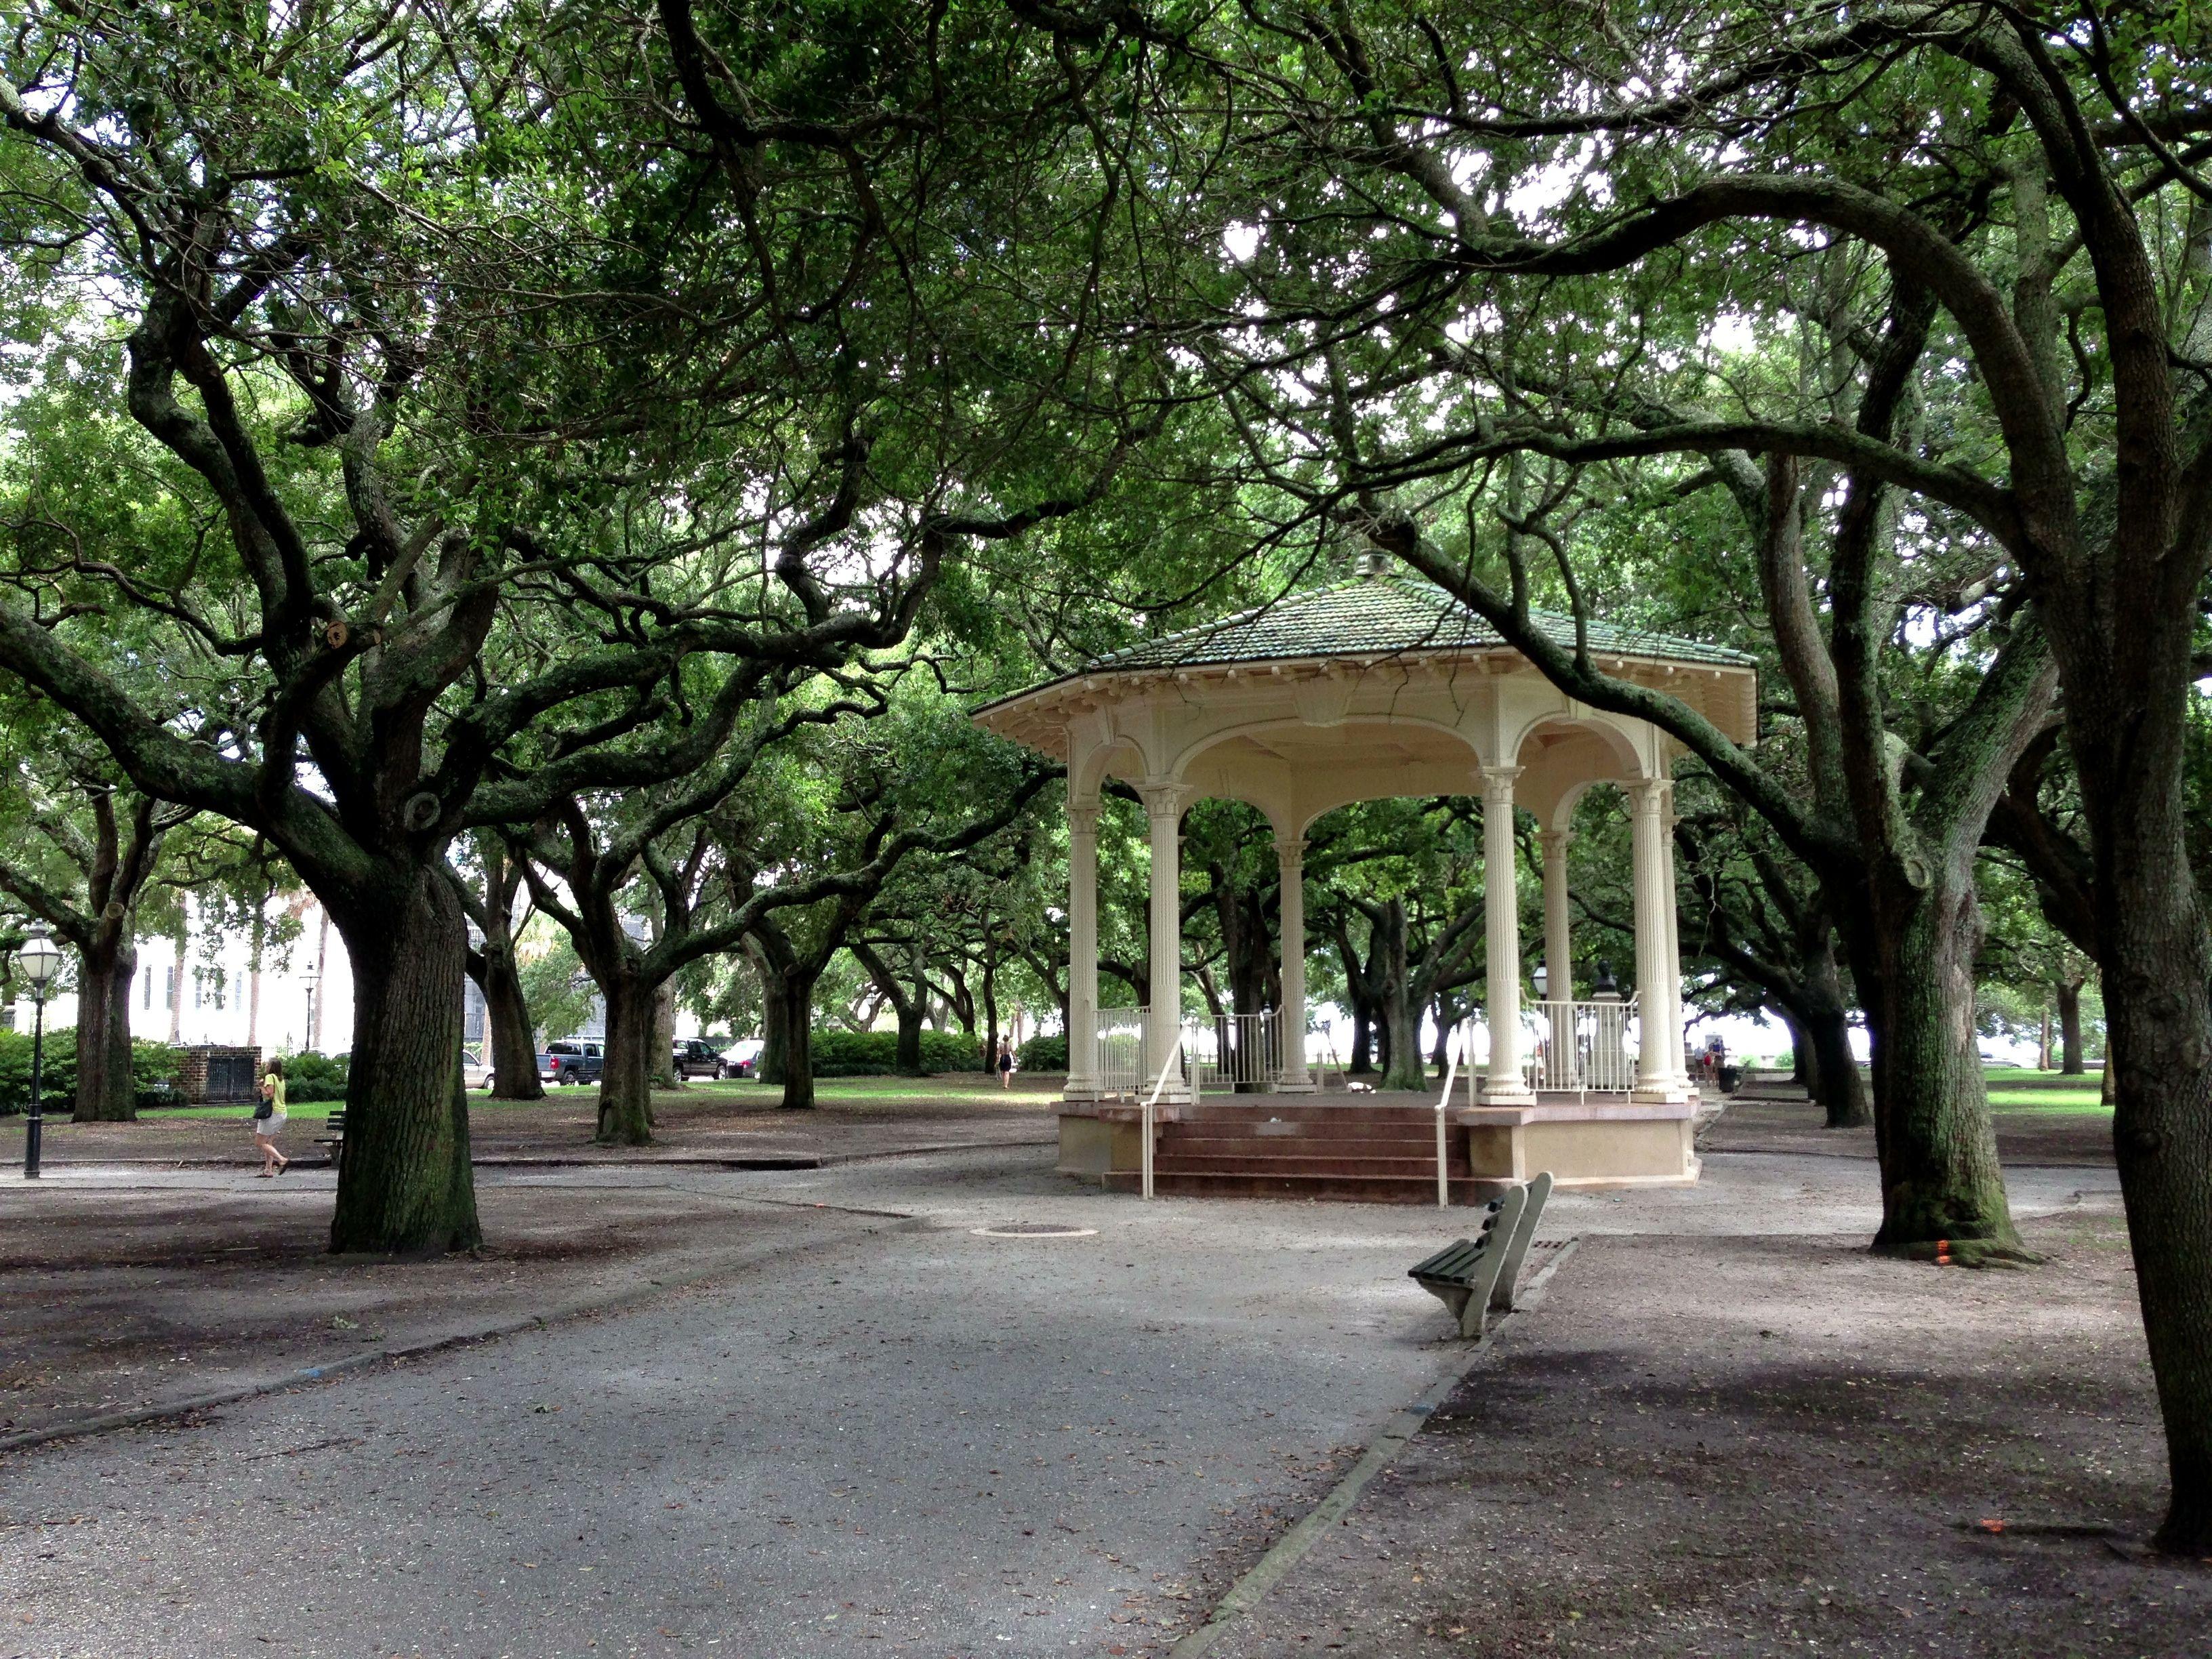 58ffce5307dfd2a4e798c99445ffec68 - White Point Gardens In Charleston Sc